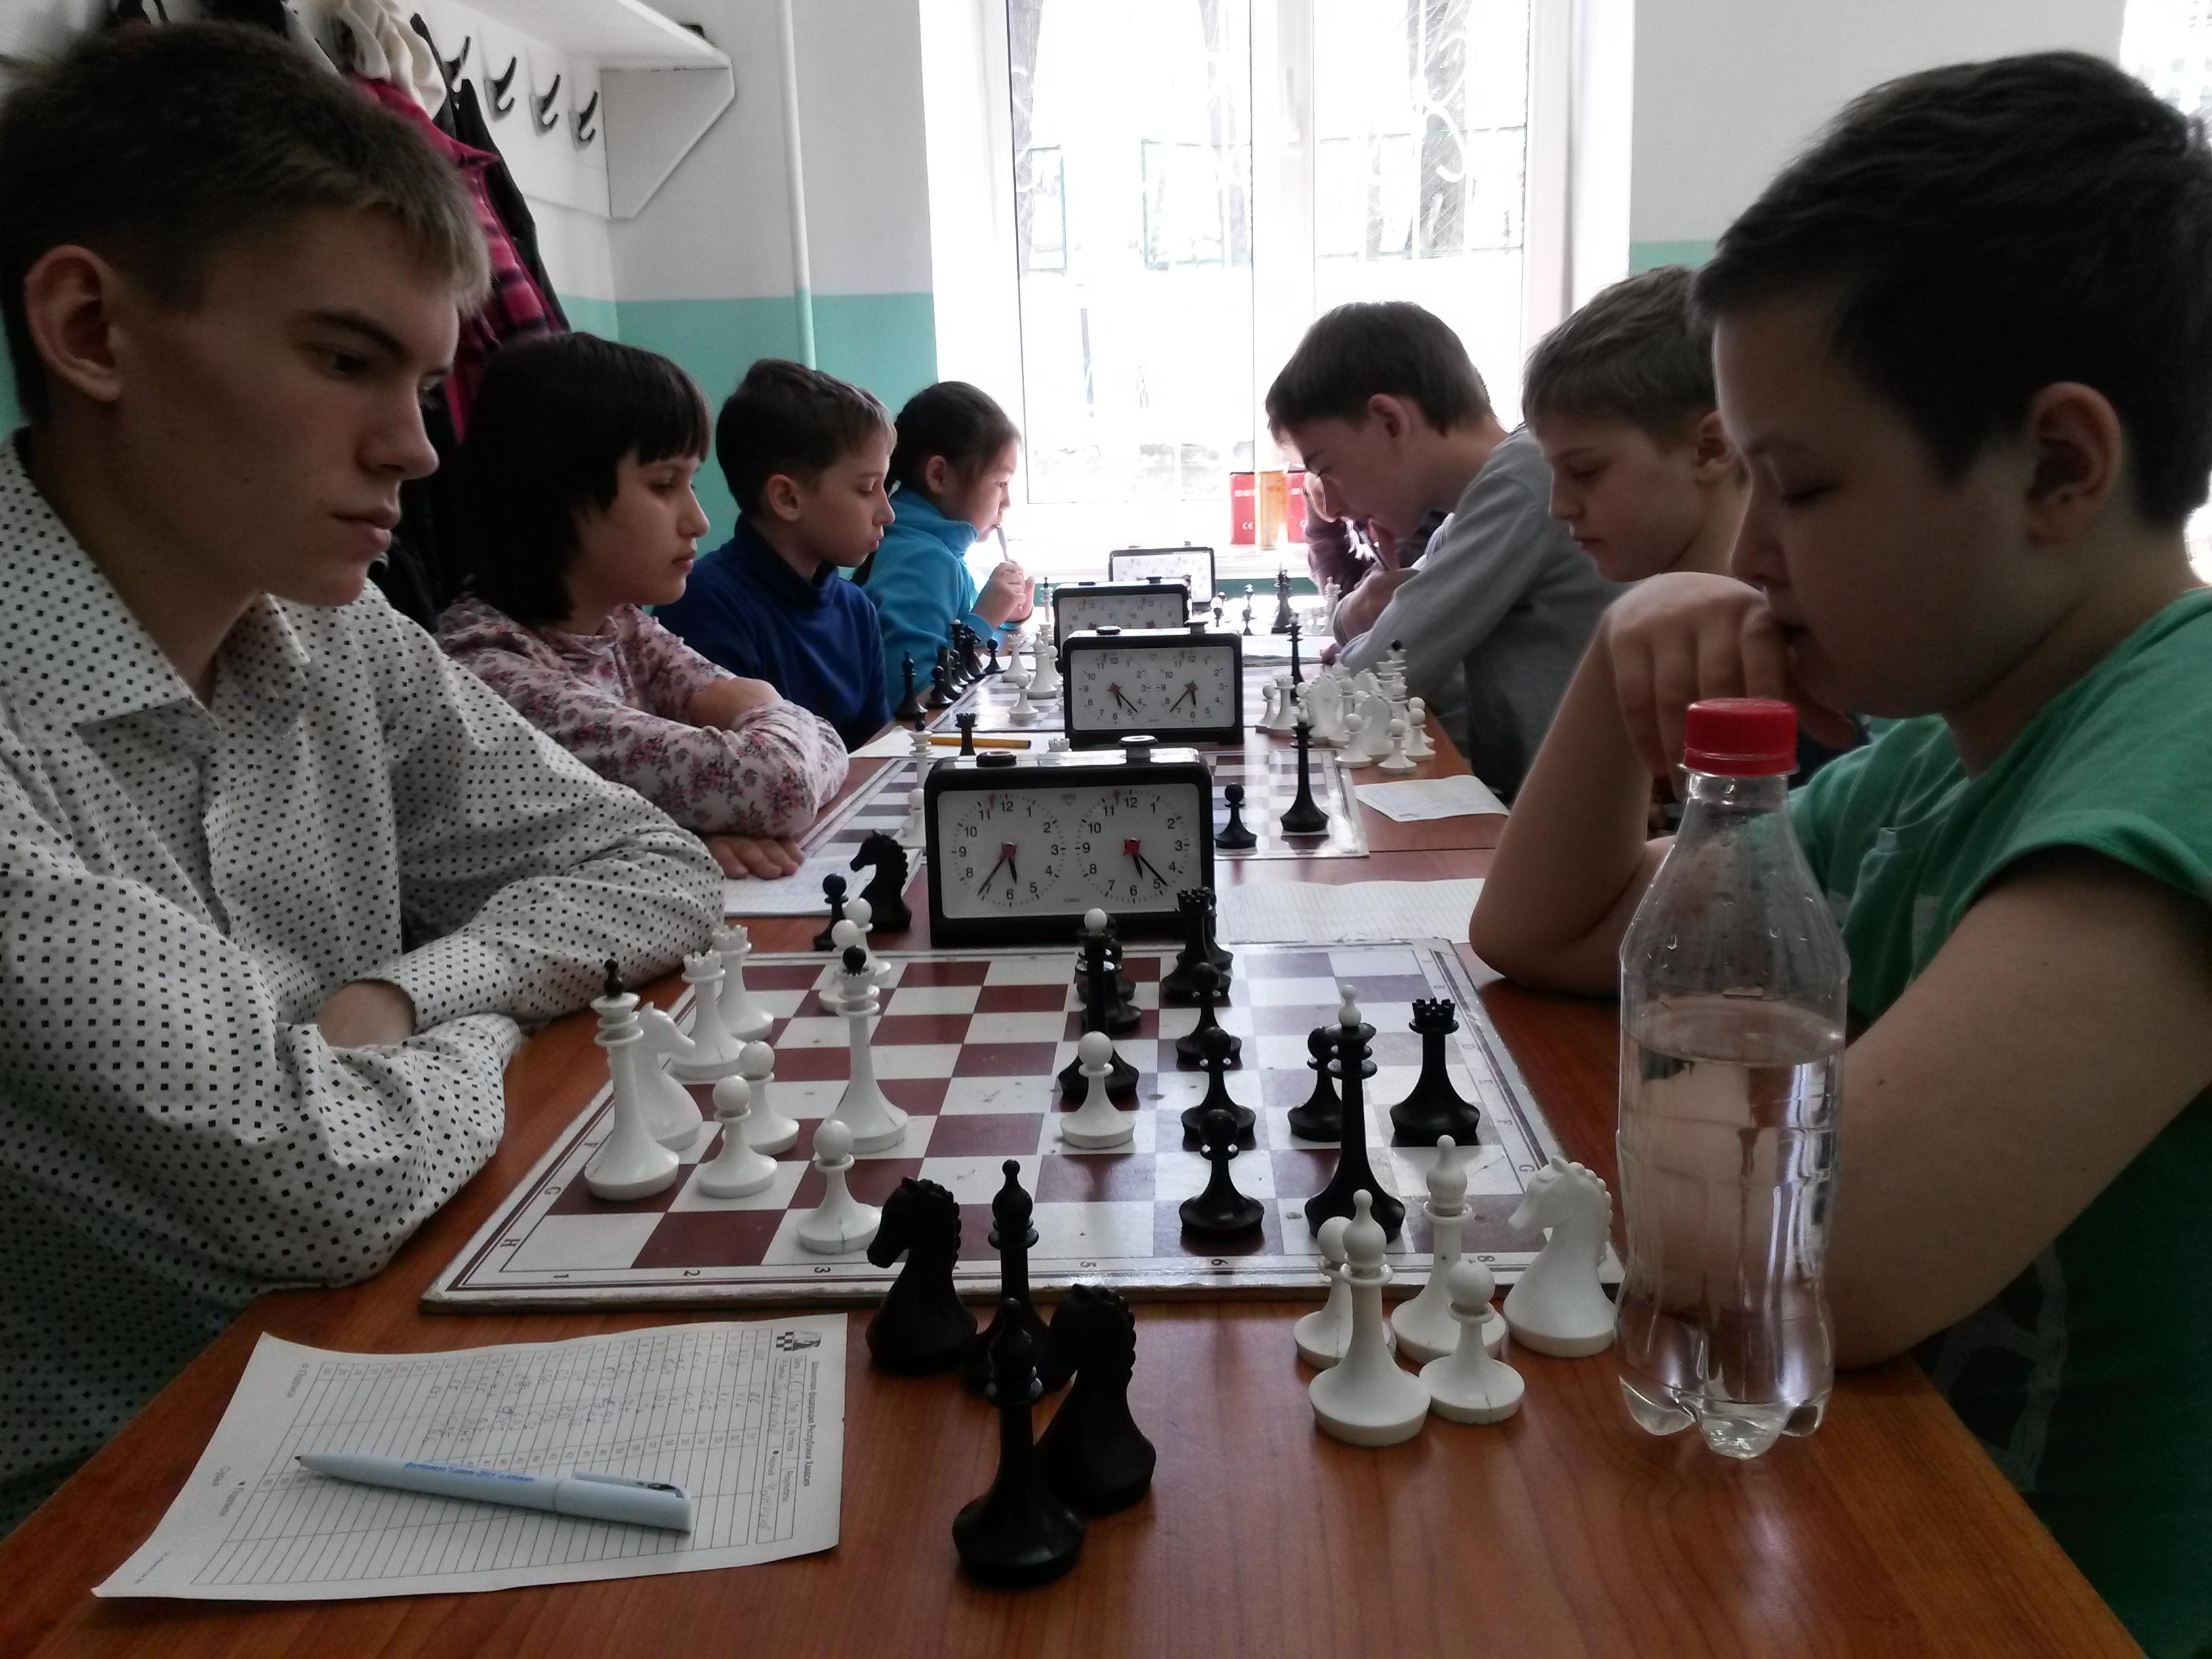 Владислав Пирожков - лидер турнира Б